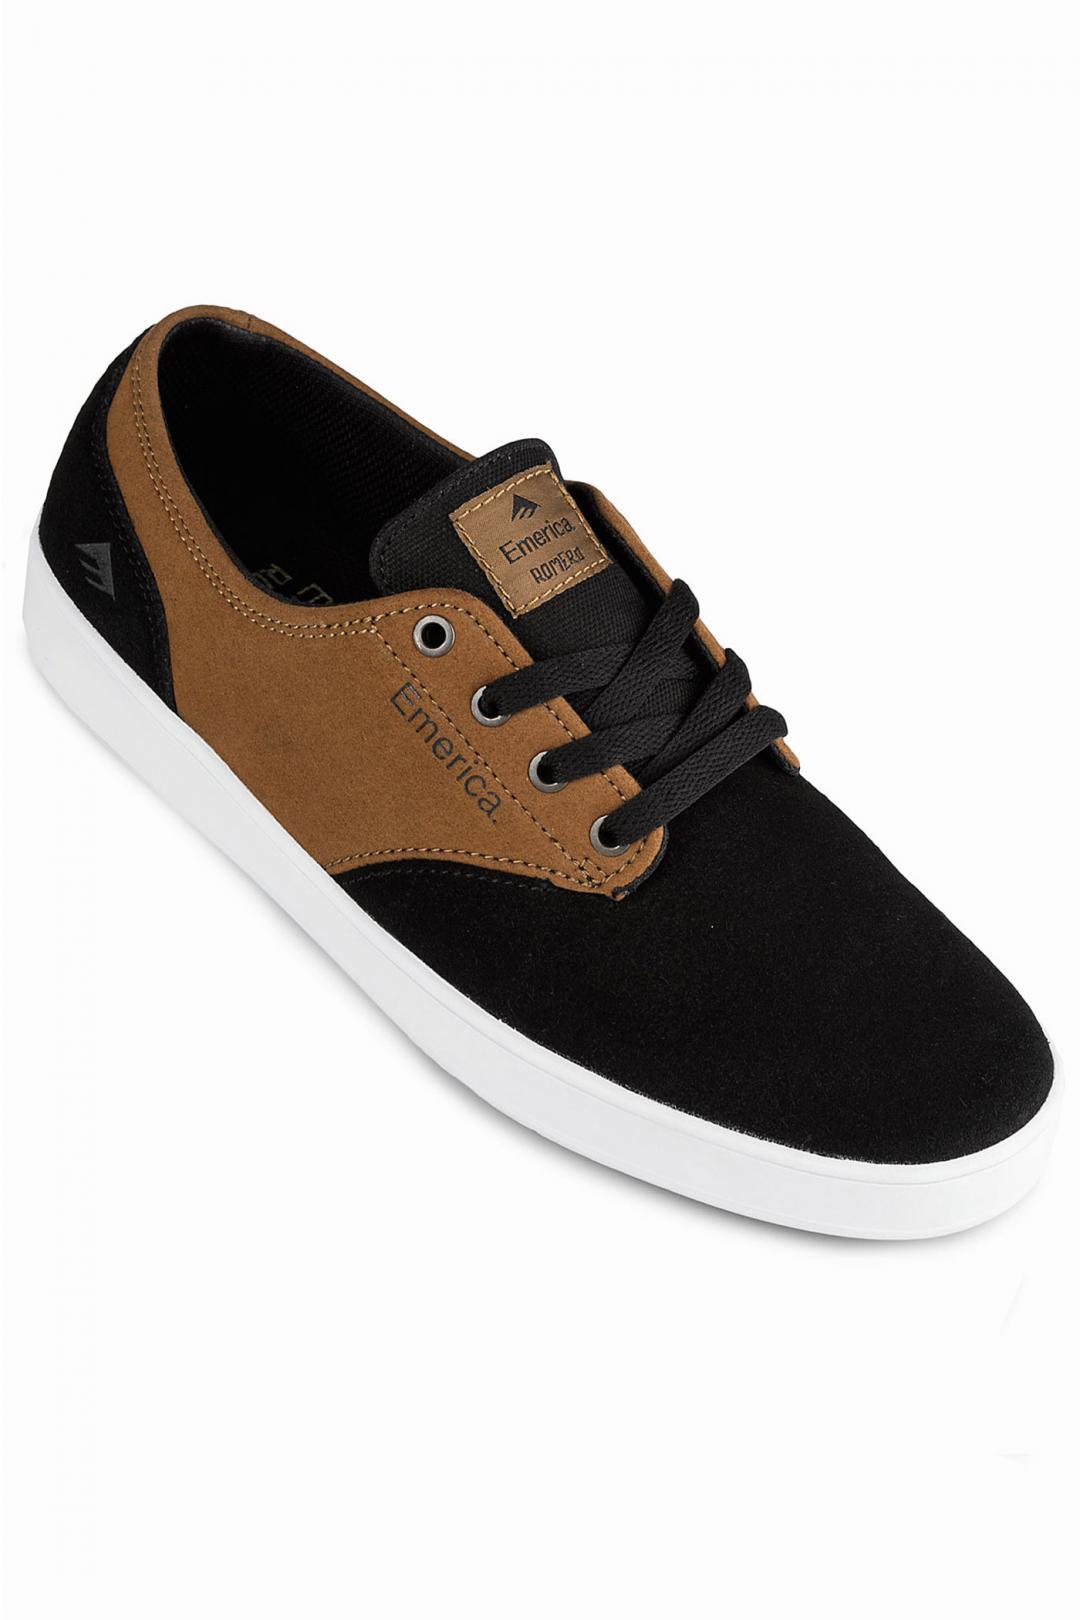 Uomo Emerica The Romero Laced black brown   Sneakers low top